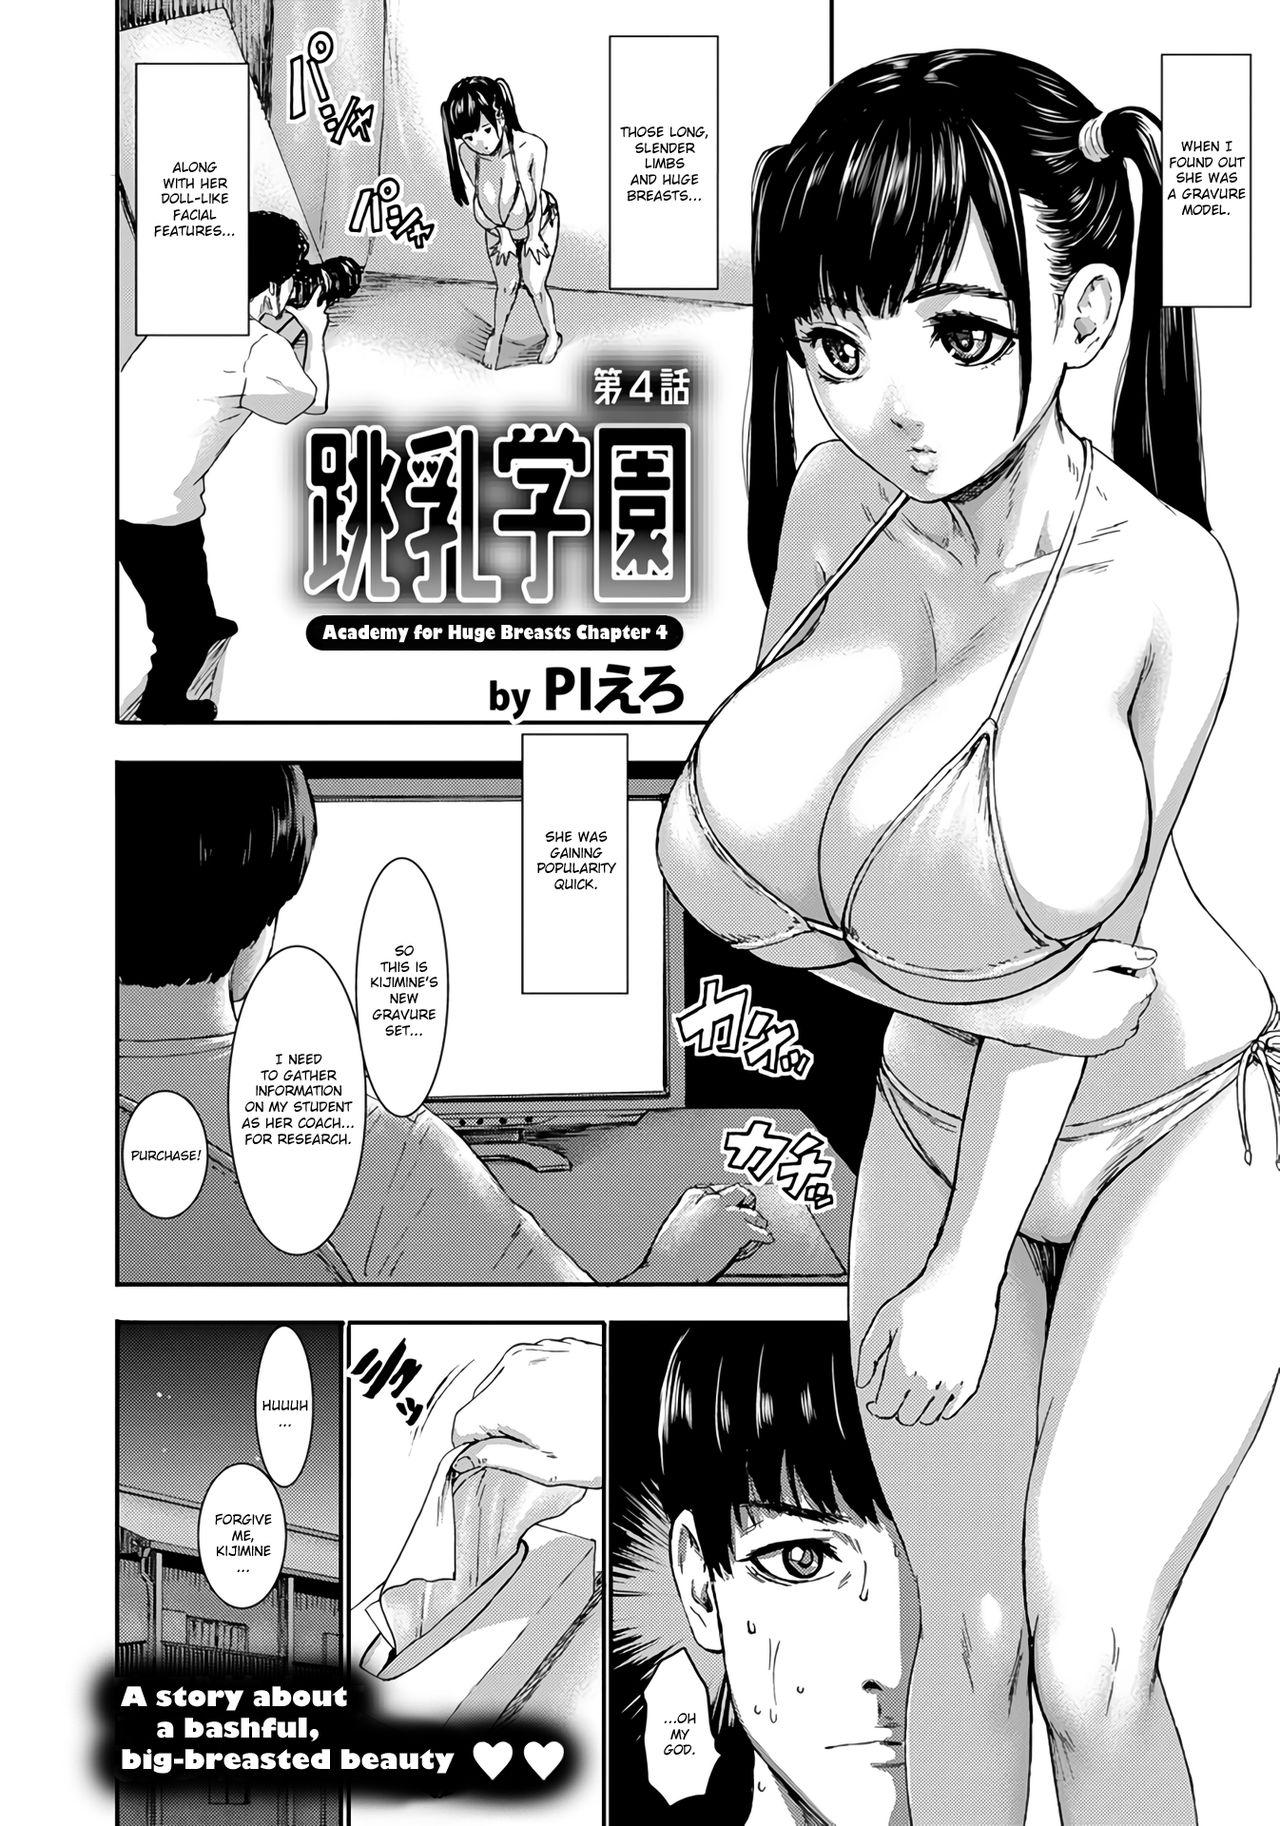 Chounyuu Gakuen | Academy For Huge Breasts 69